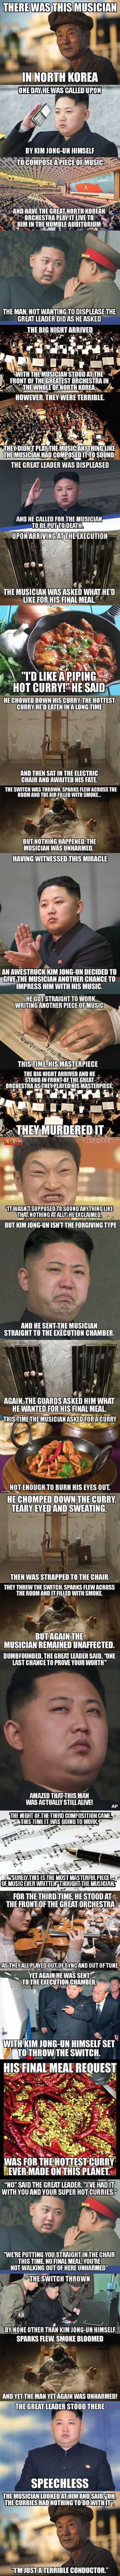 Kim Jong-Un versus Musician